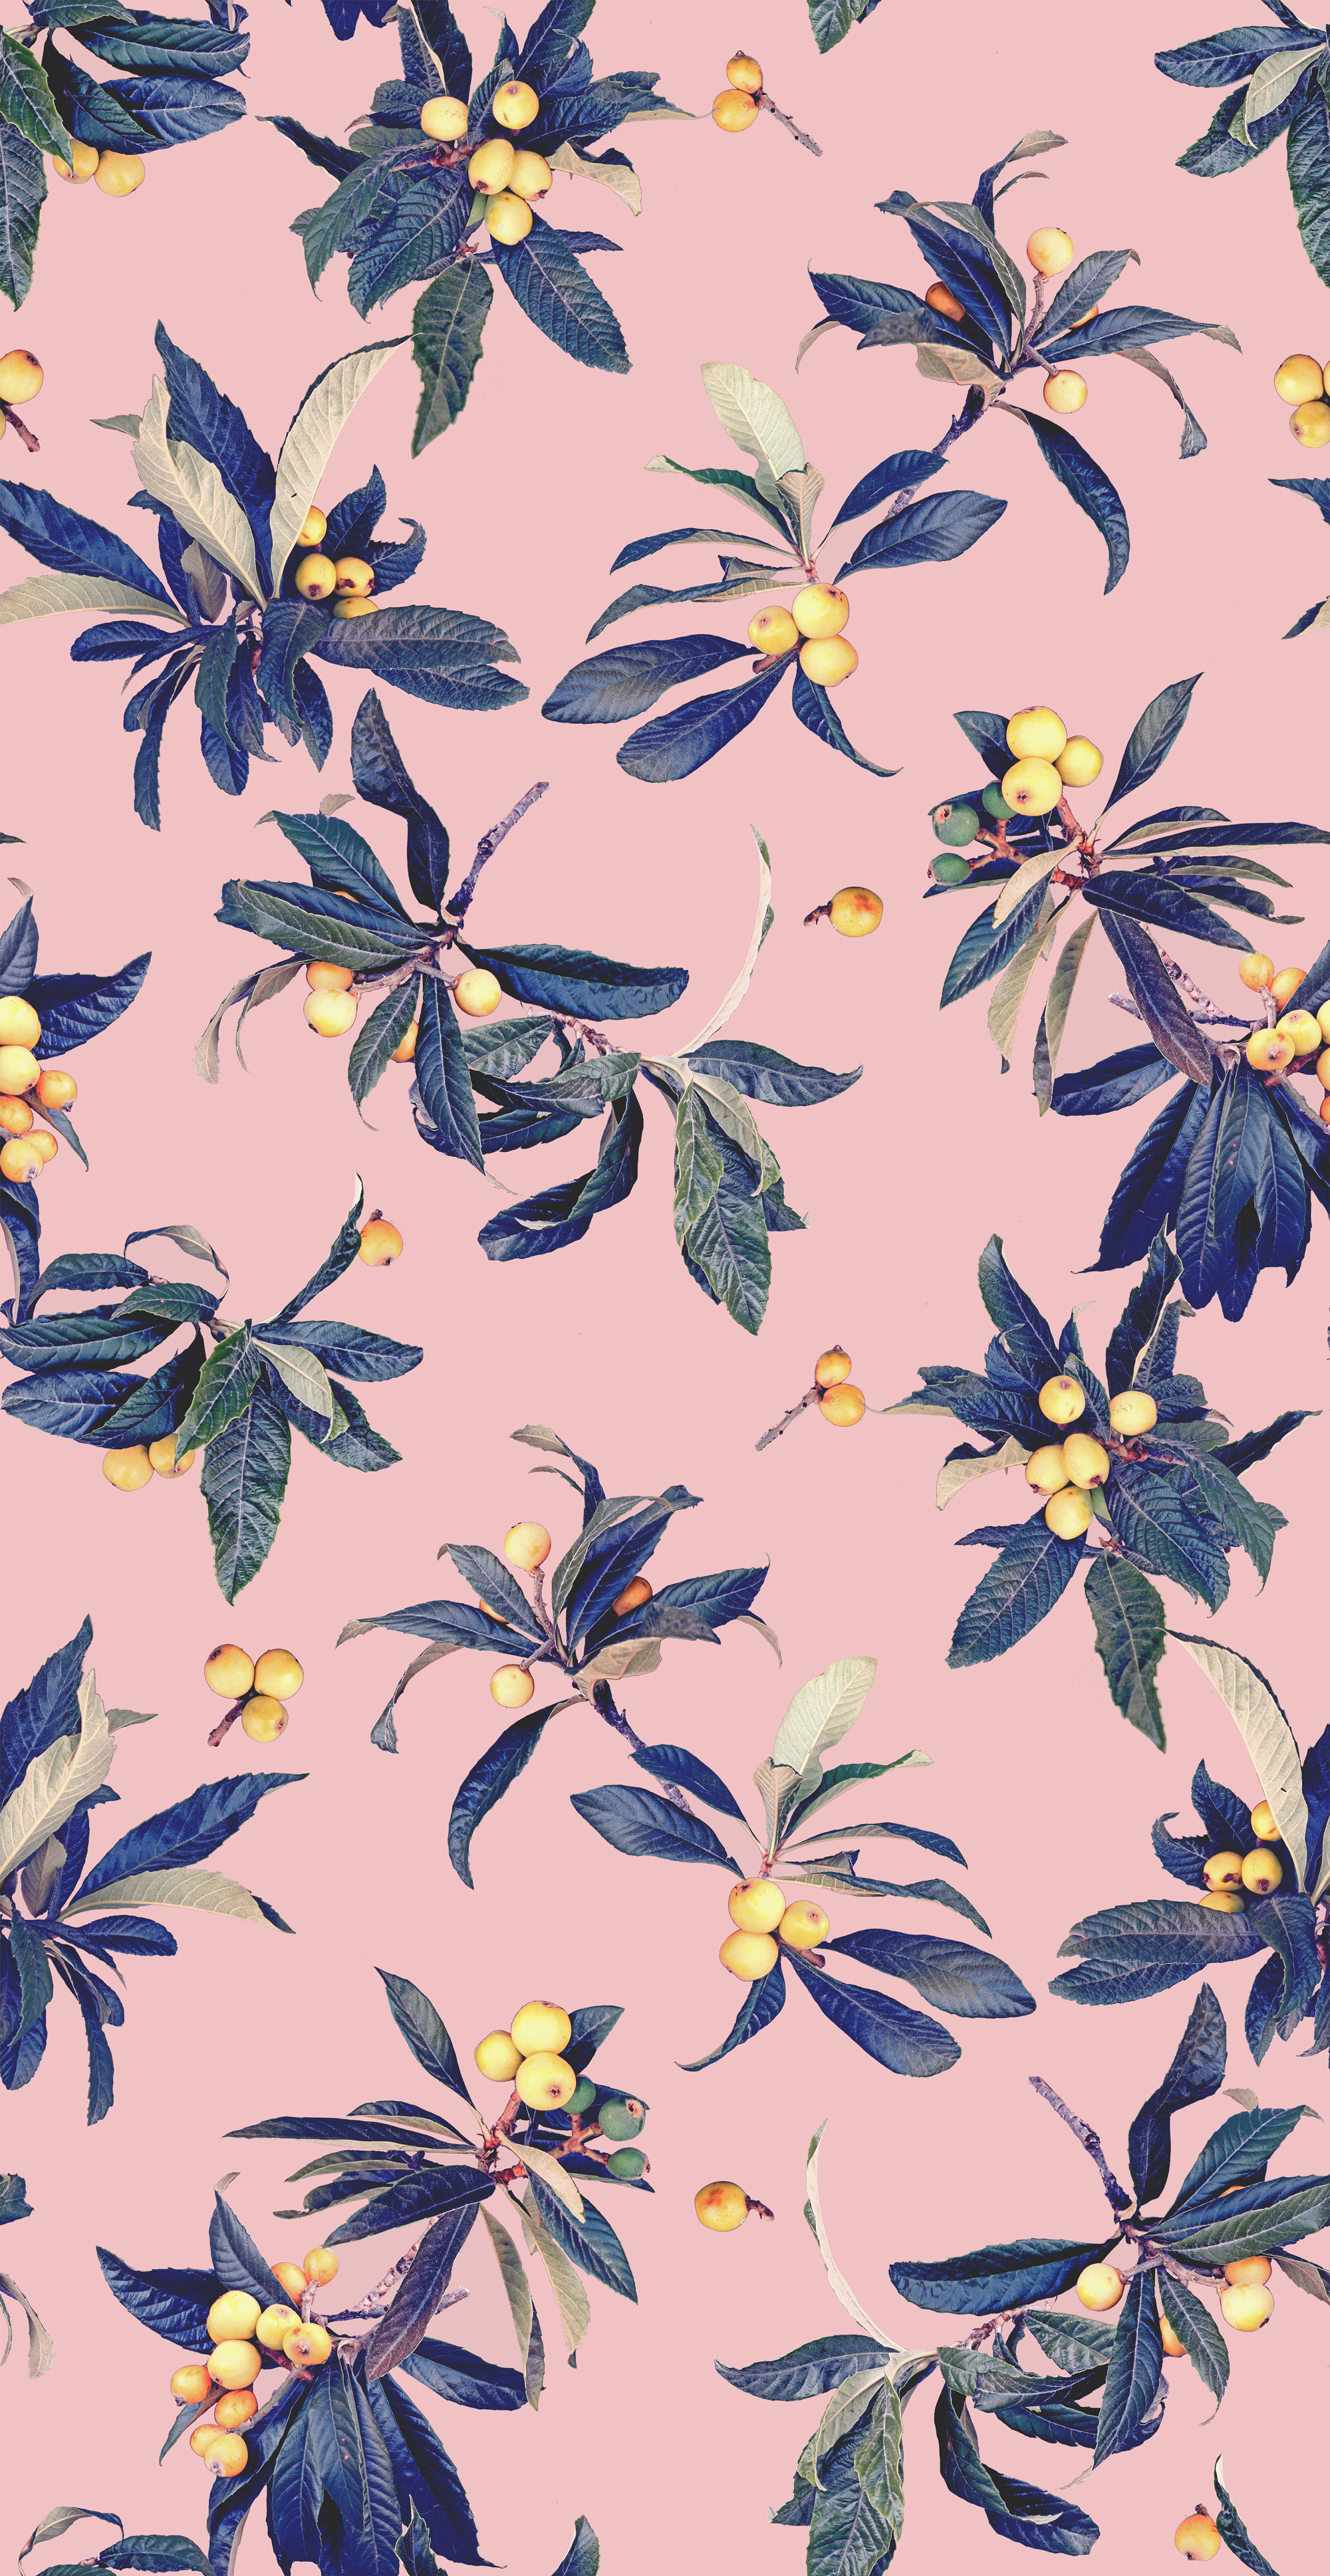 Loquat_Love_TILE_FINAL_pink_02_WEB.jpg